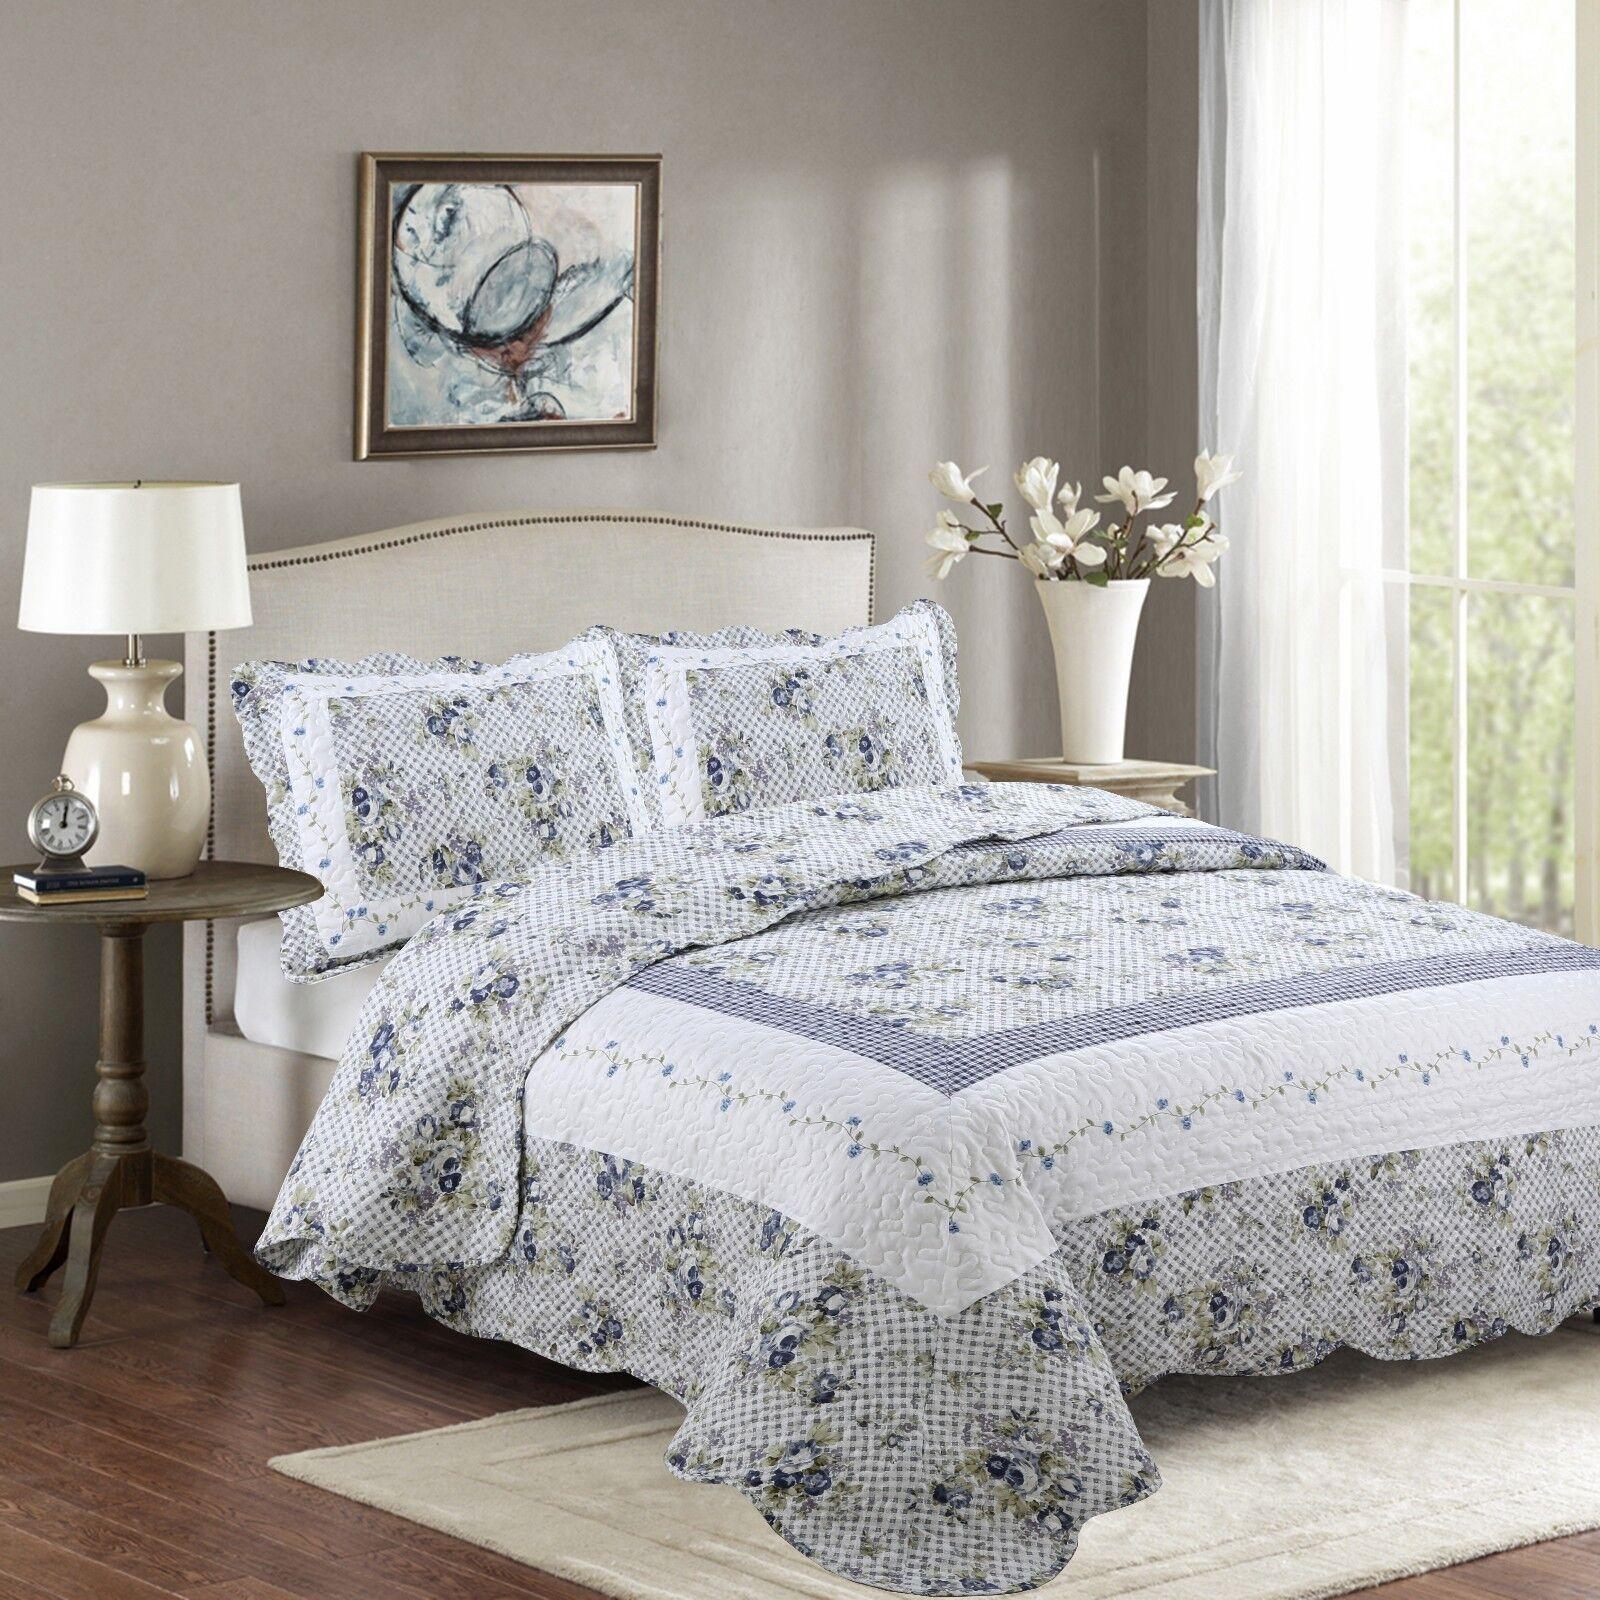 Fancy Linen Reversible Bedspread Floral White Blue Green All